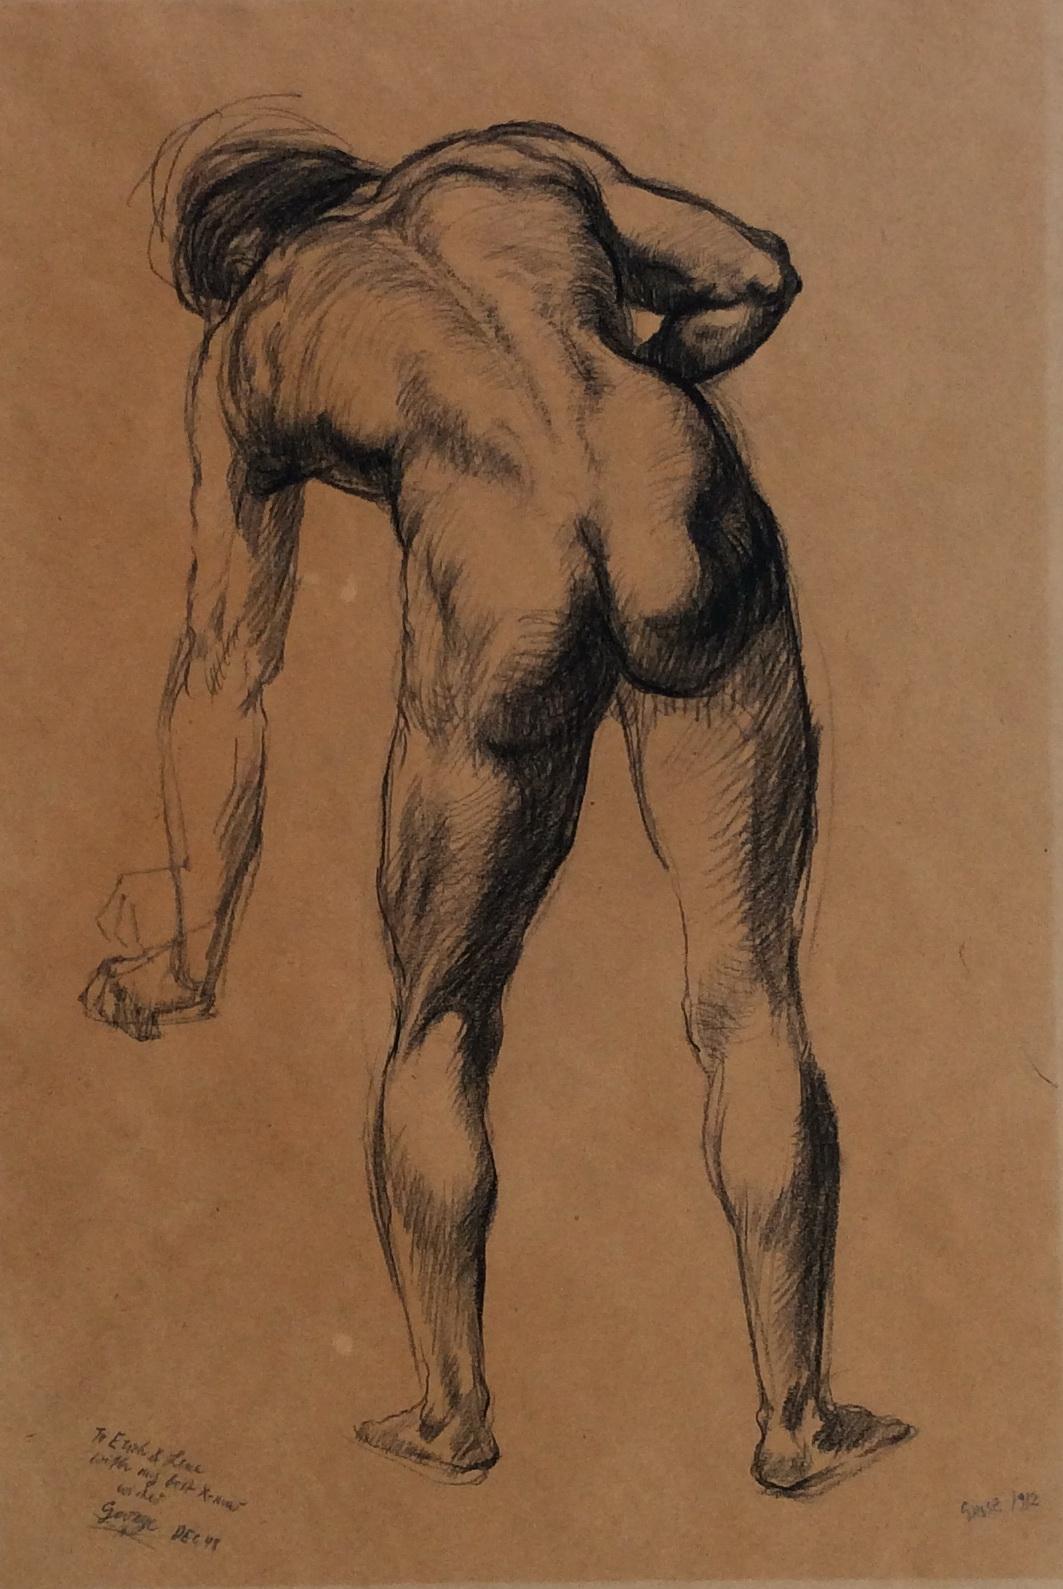 Nude Male Figure by George Grosz